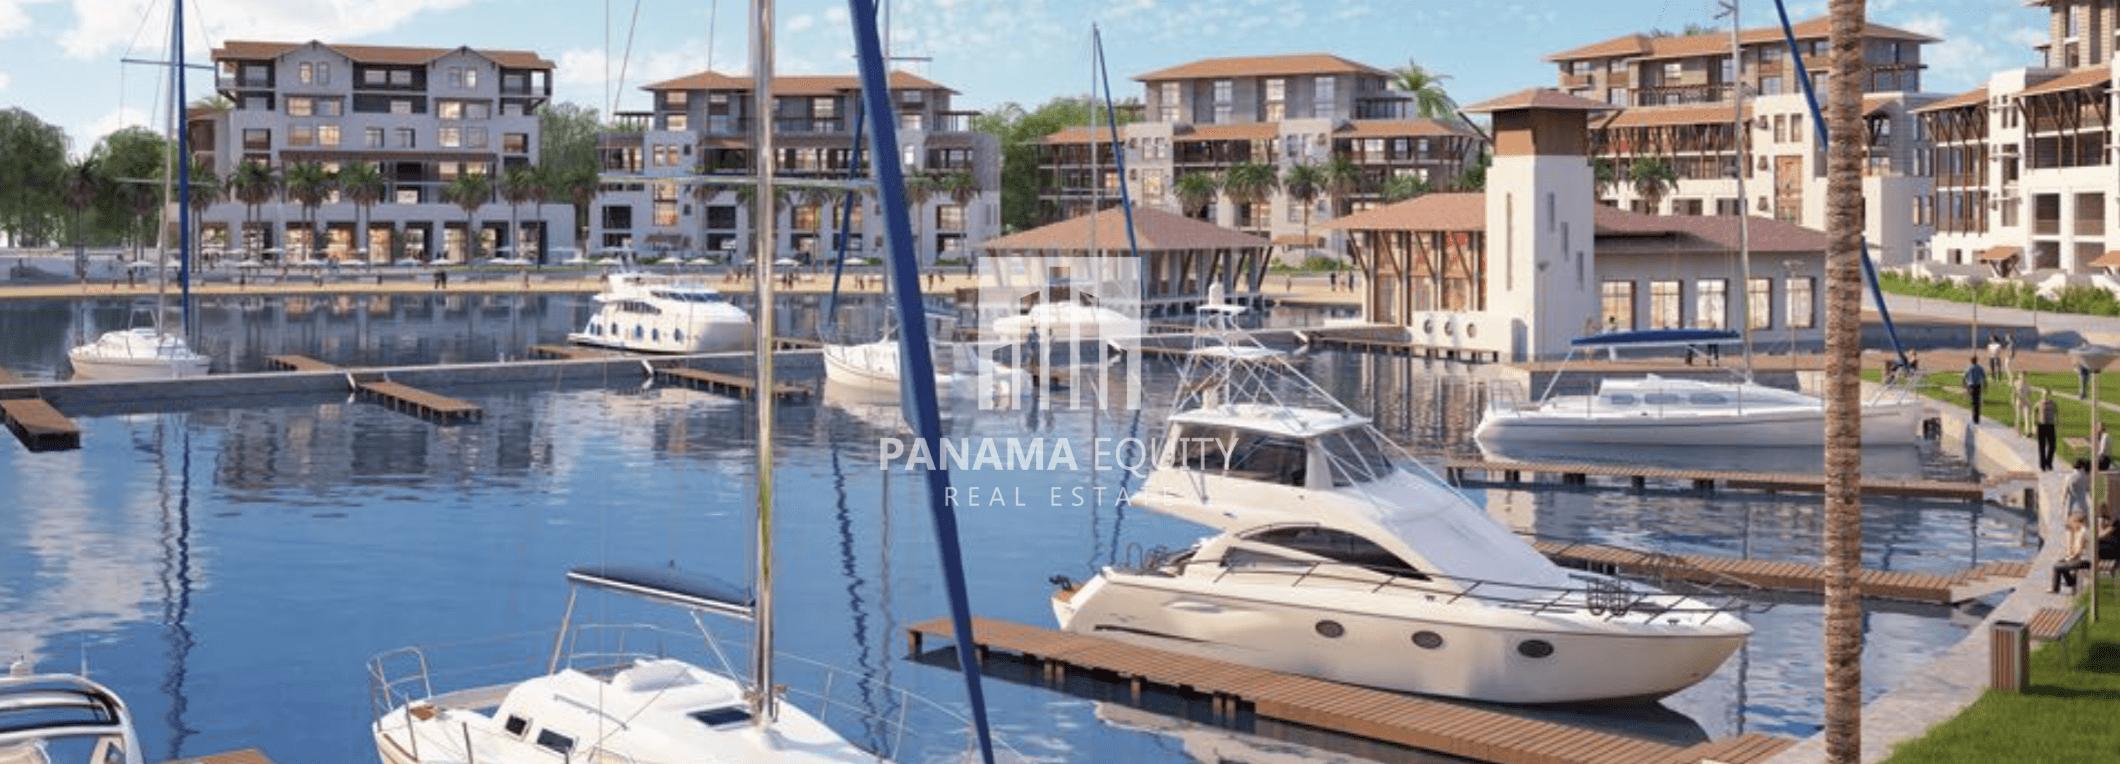 yachts-in-dock-coronado-panama